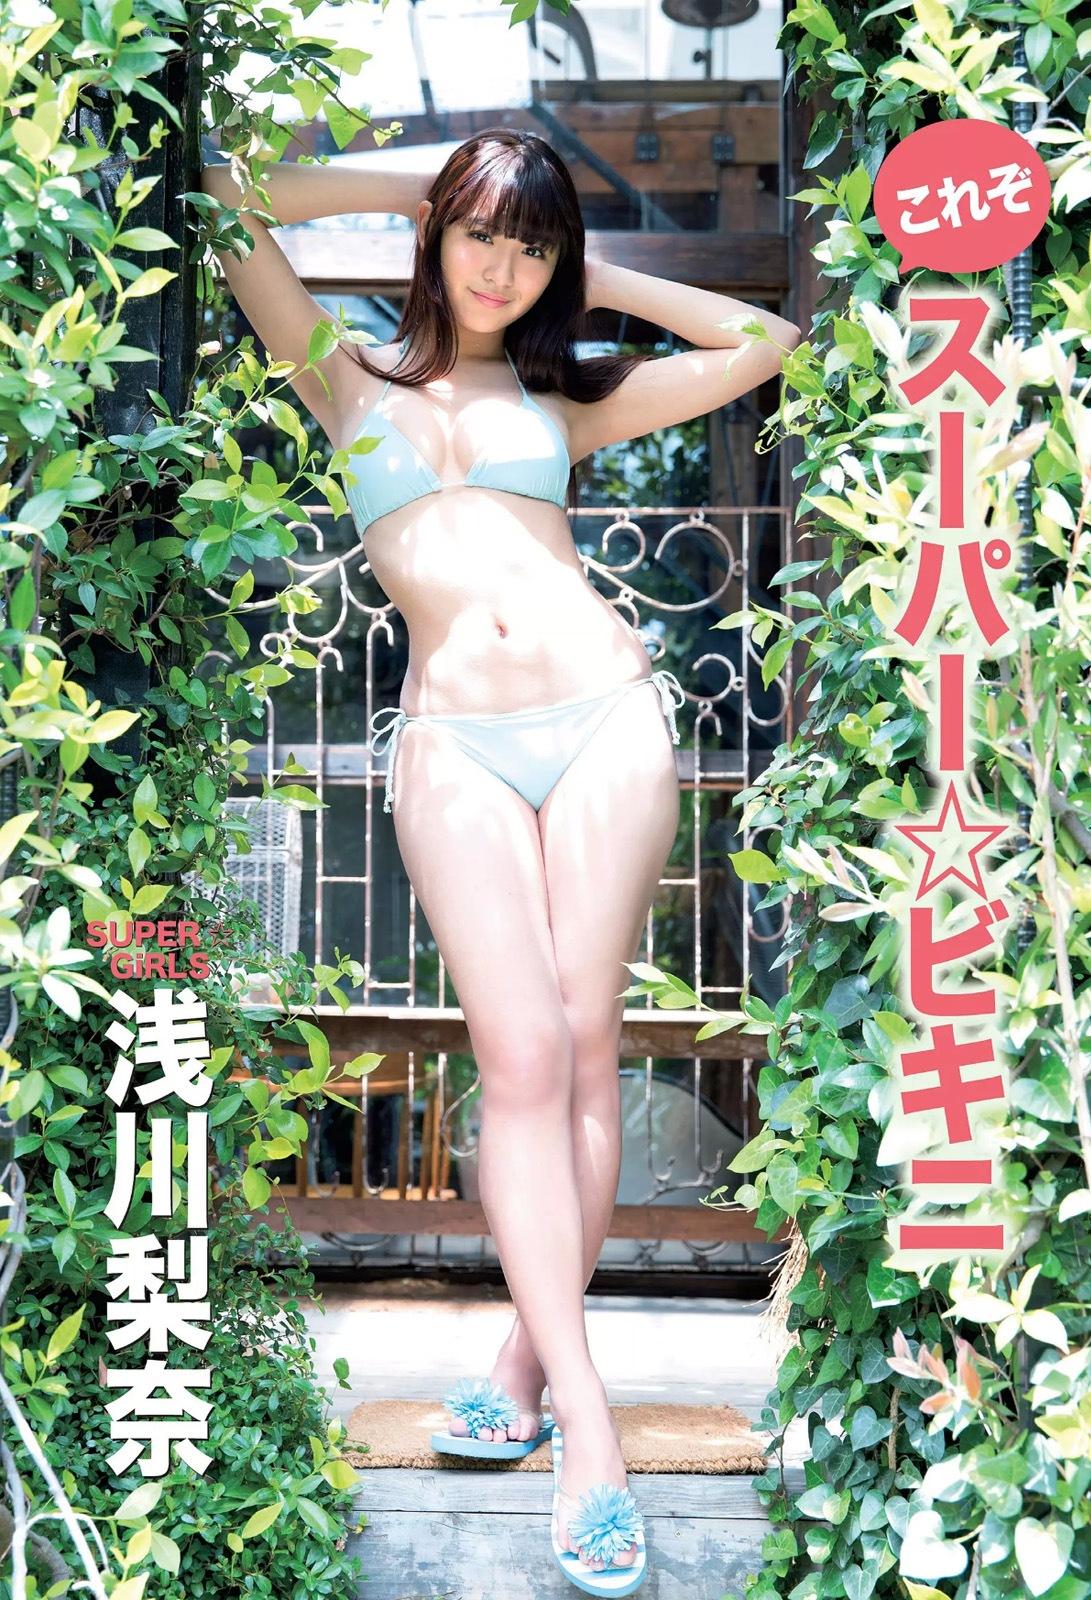 Asakawa Nana 浅川梨奈 SUPER☆GiRLS, FLASH 2017.07.11 (フラッシュ 2017年07月11日号)